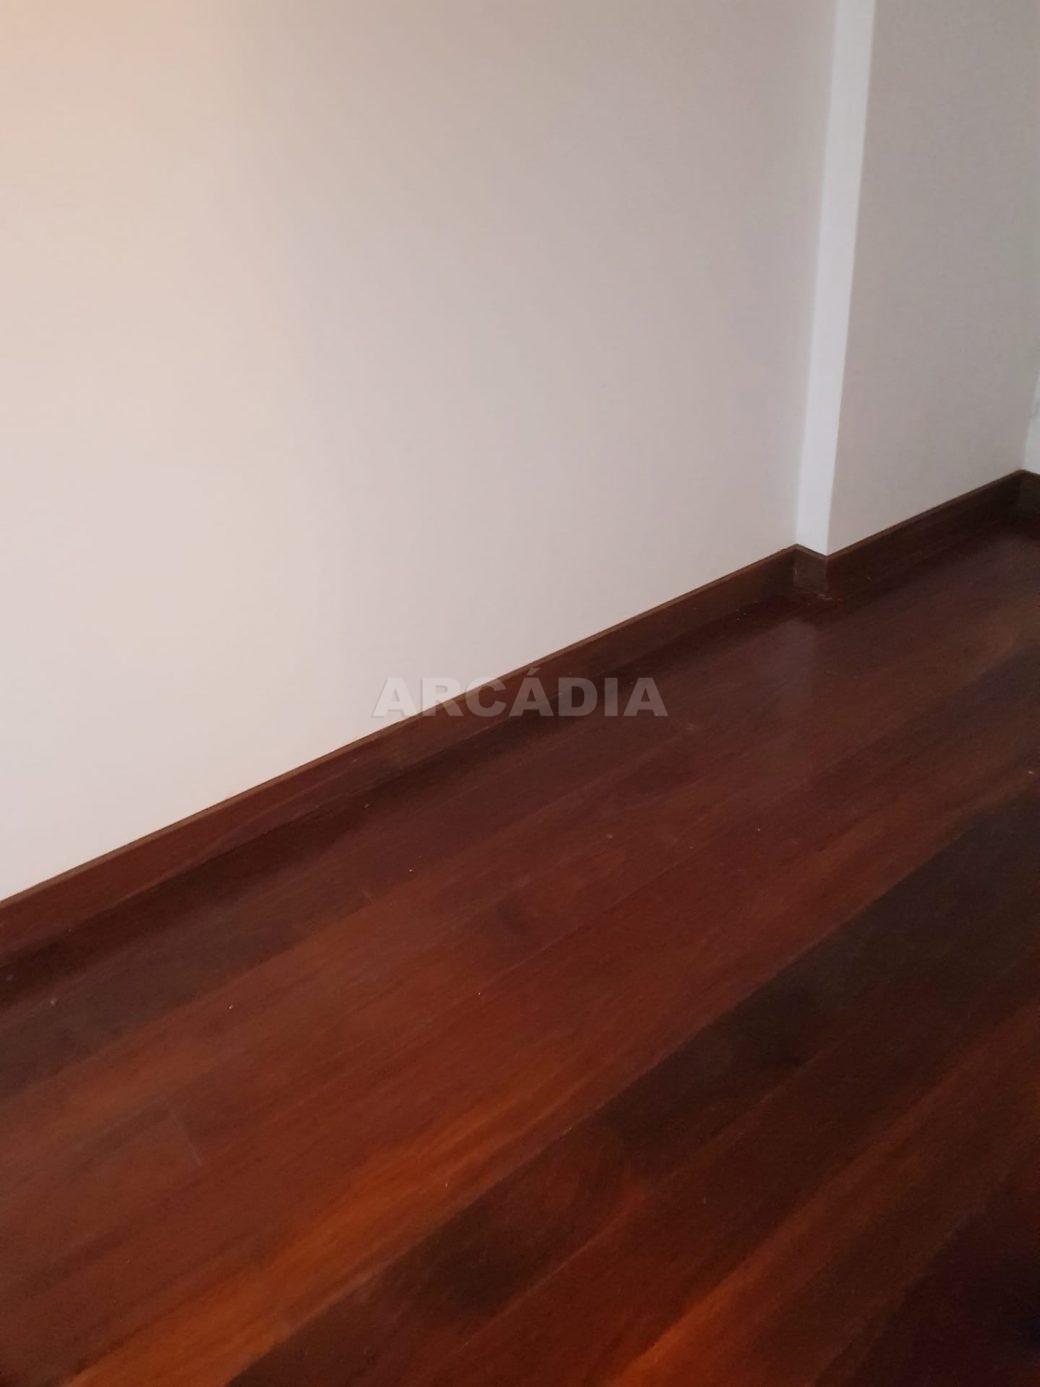 arcadia-imobiliaria-moradia-3665-526